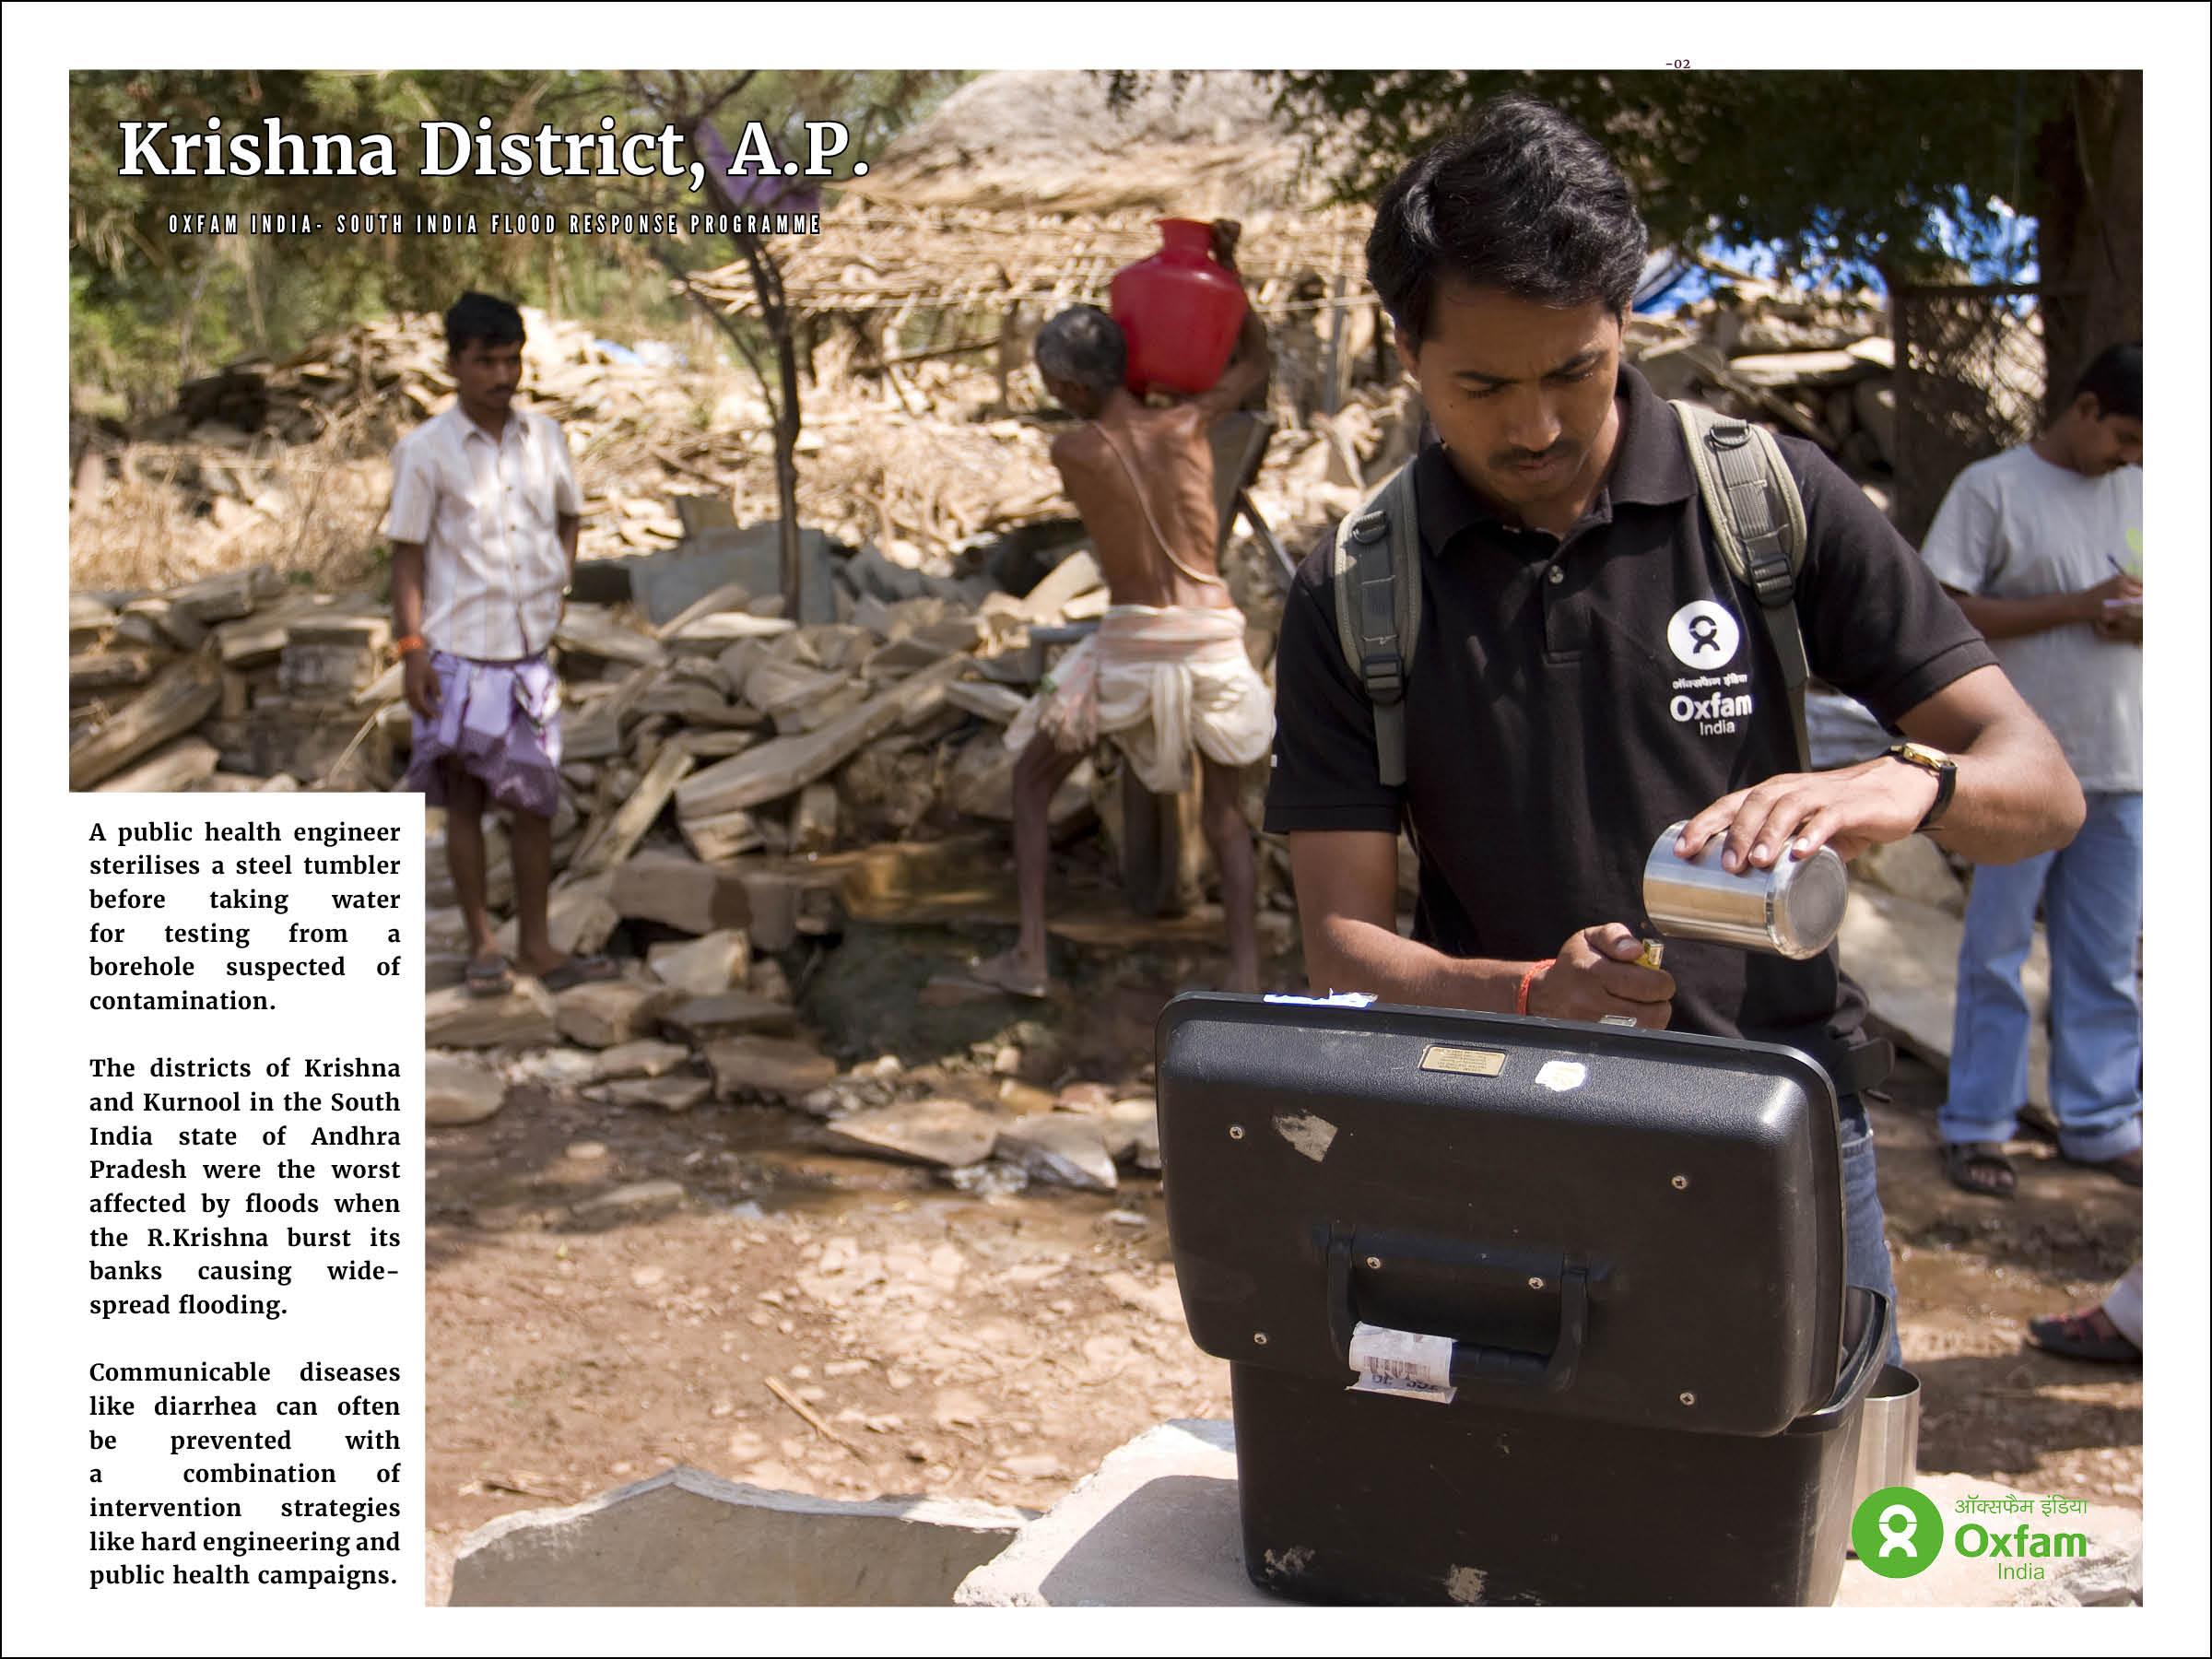 Oxfam India: South India Flood Response Programme